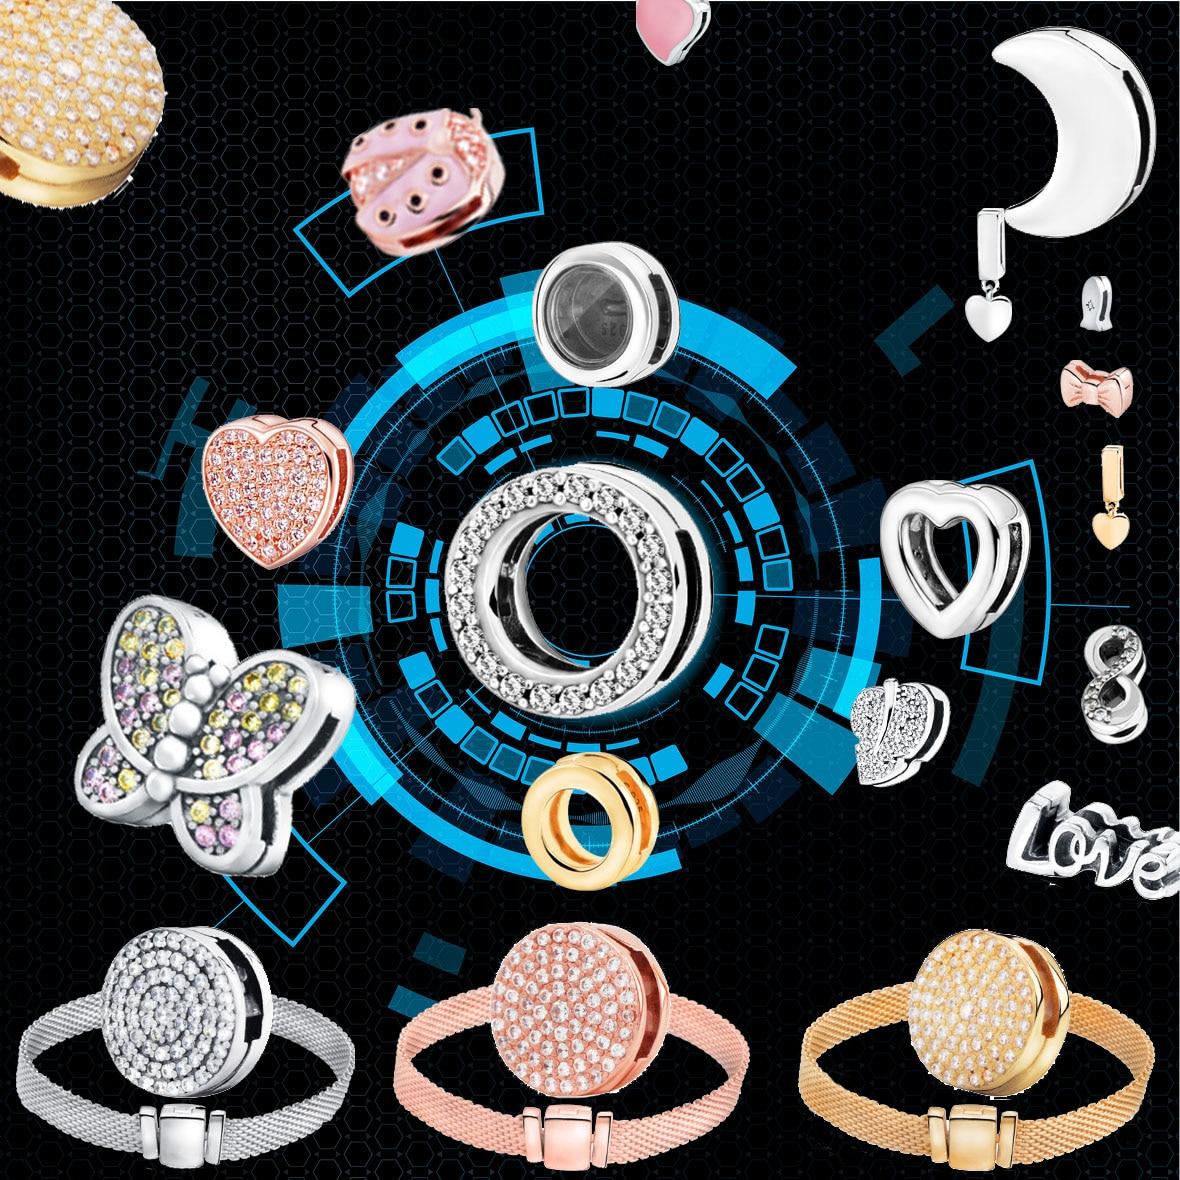 Fashion 925 Sterling Silver Beads Dazzling Round Clips Charms Fit Original Pandora Reflexions Bracelets Women DIY Jewelry